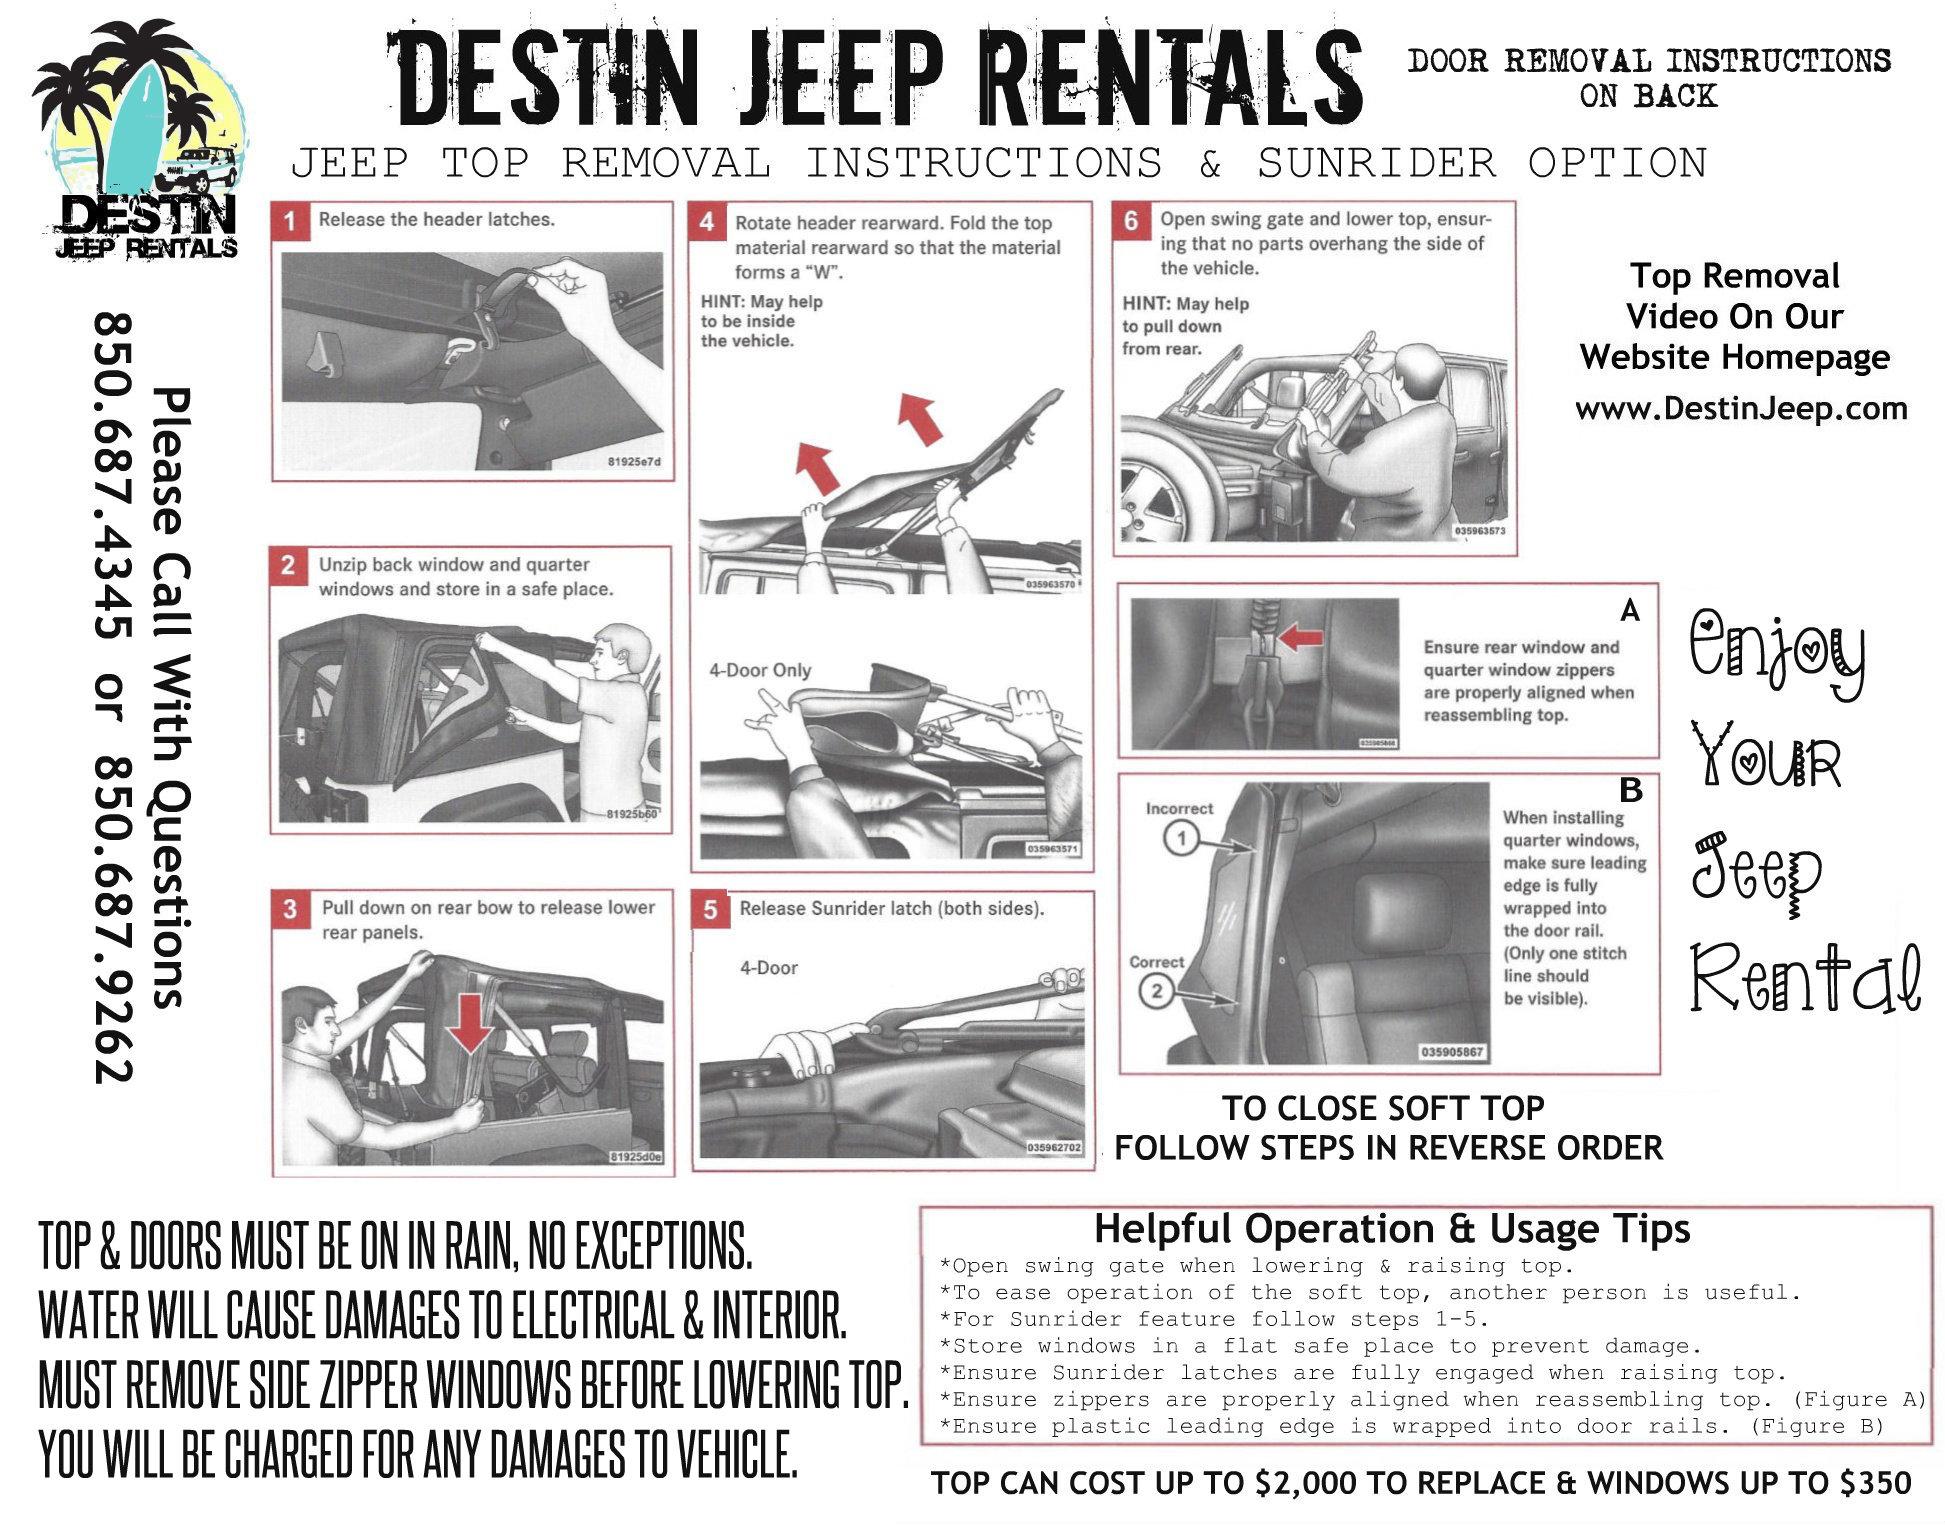 Jeep Wrangler Door Removal Instructions